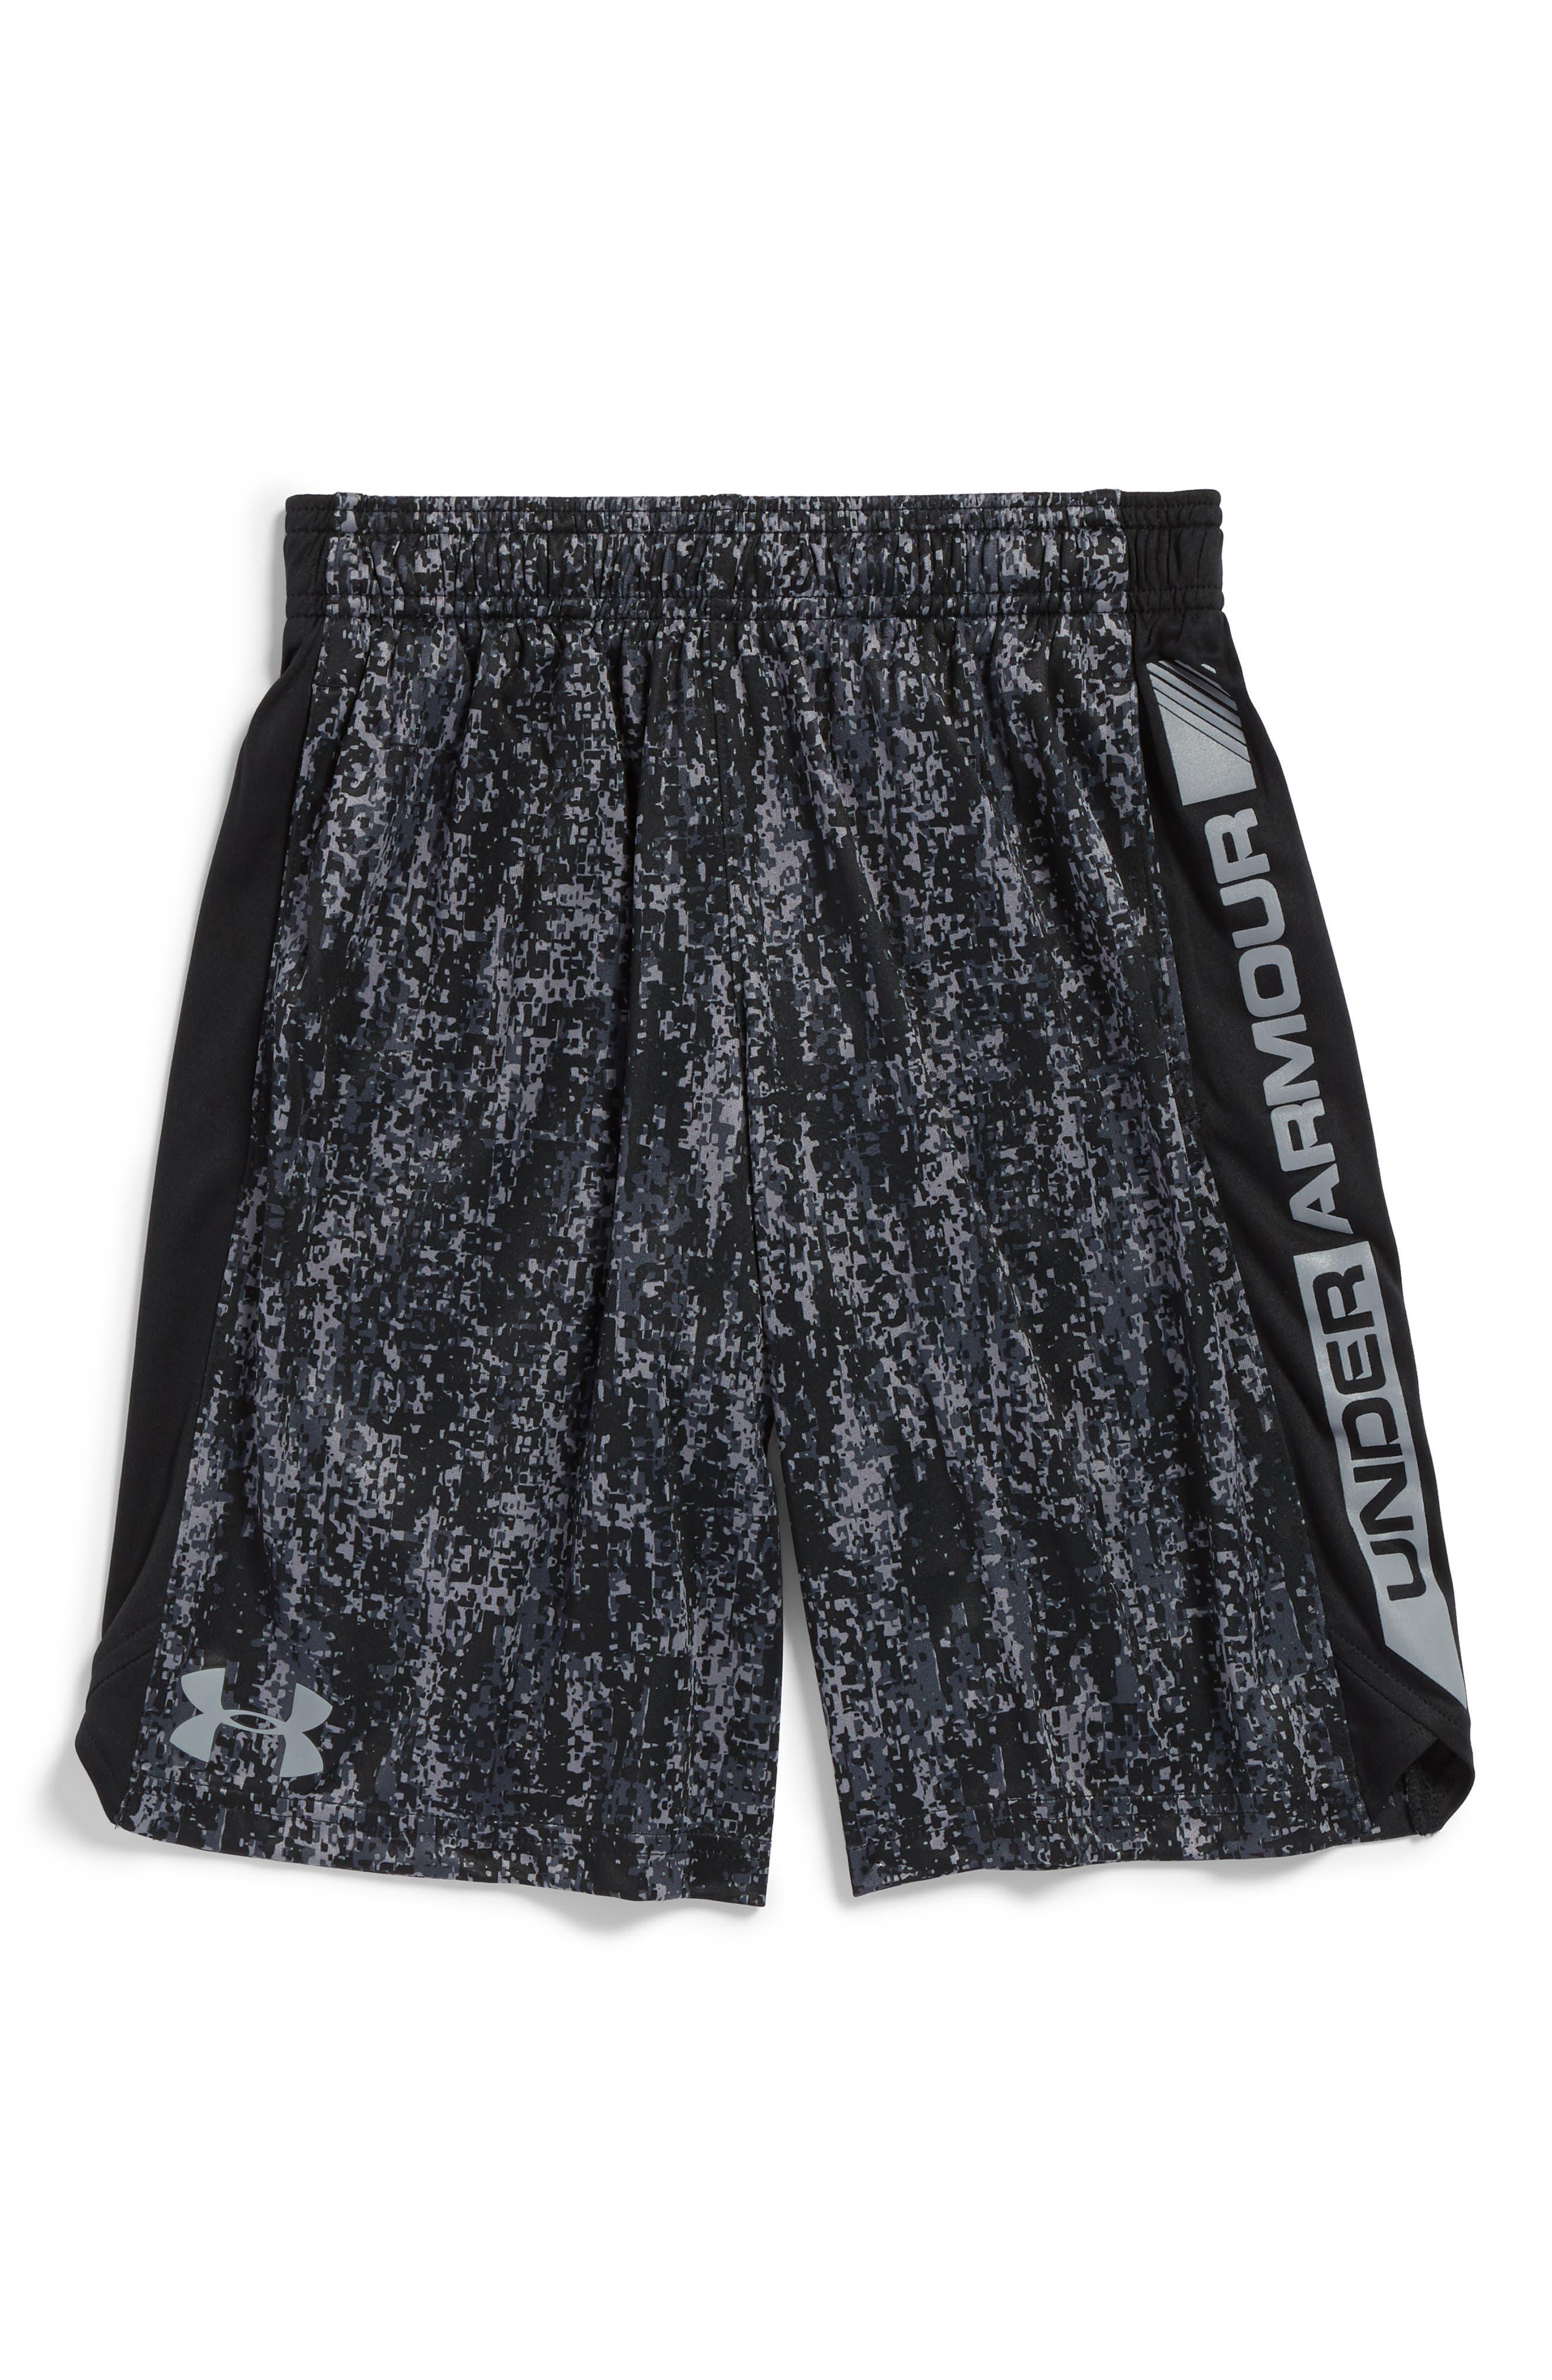 Alternate Image 1 Selected - Under Armour Eliminator Athletic HeatGear® Shorts (Little Boys & Big Boys)